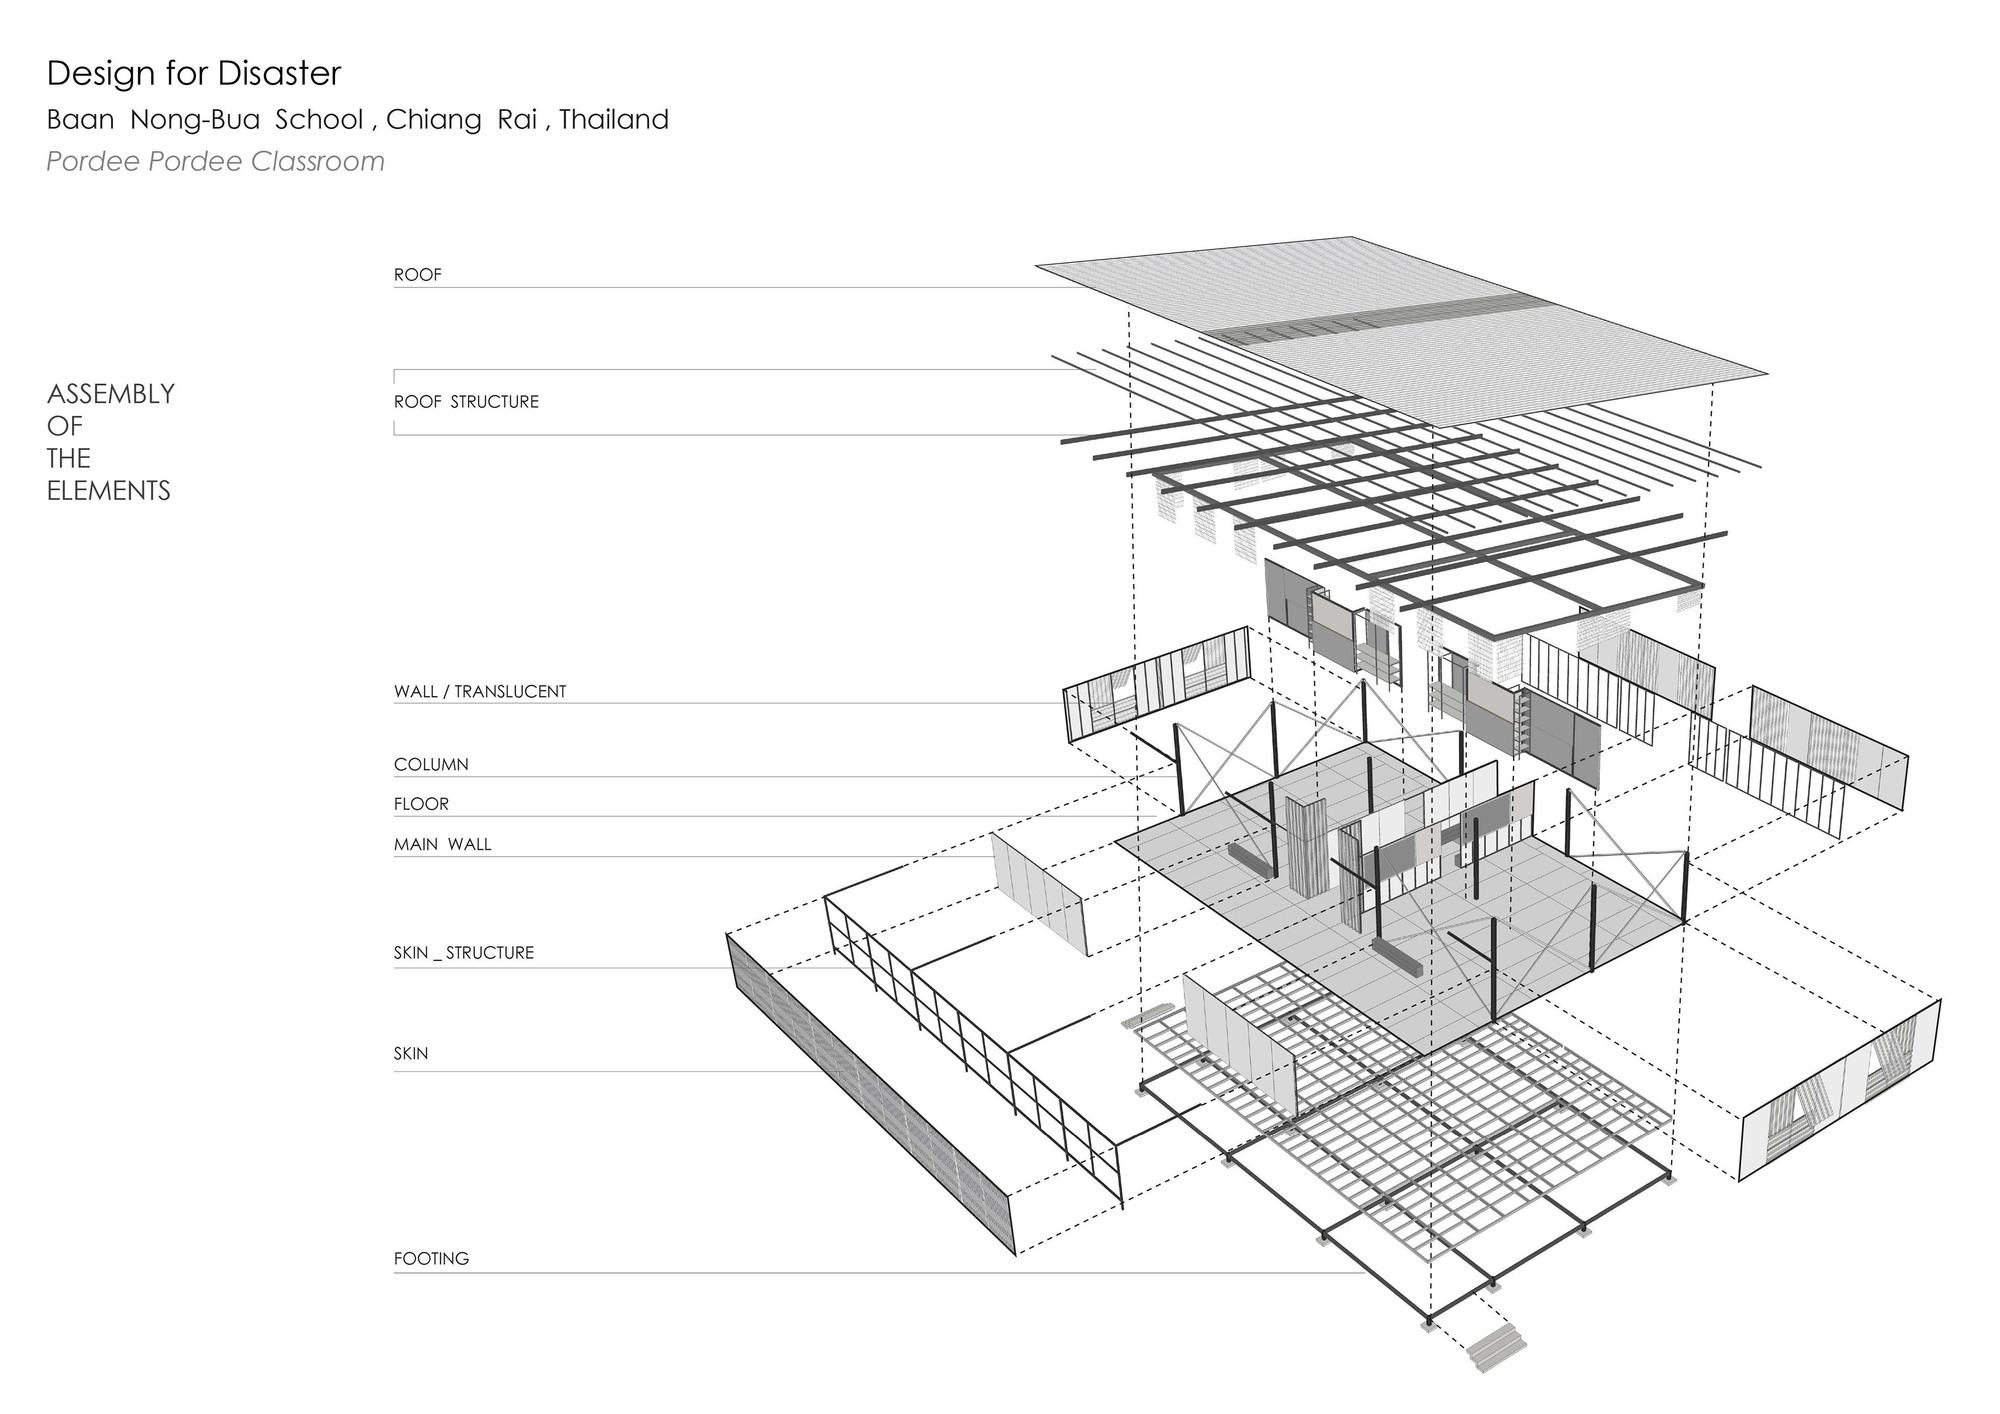 exploded axon diagram cessna 172 alternator wiring gallery of baan nong bua school / junsekino architect and design - 19